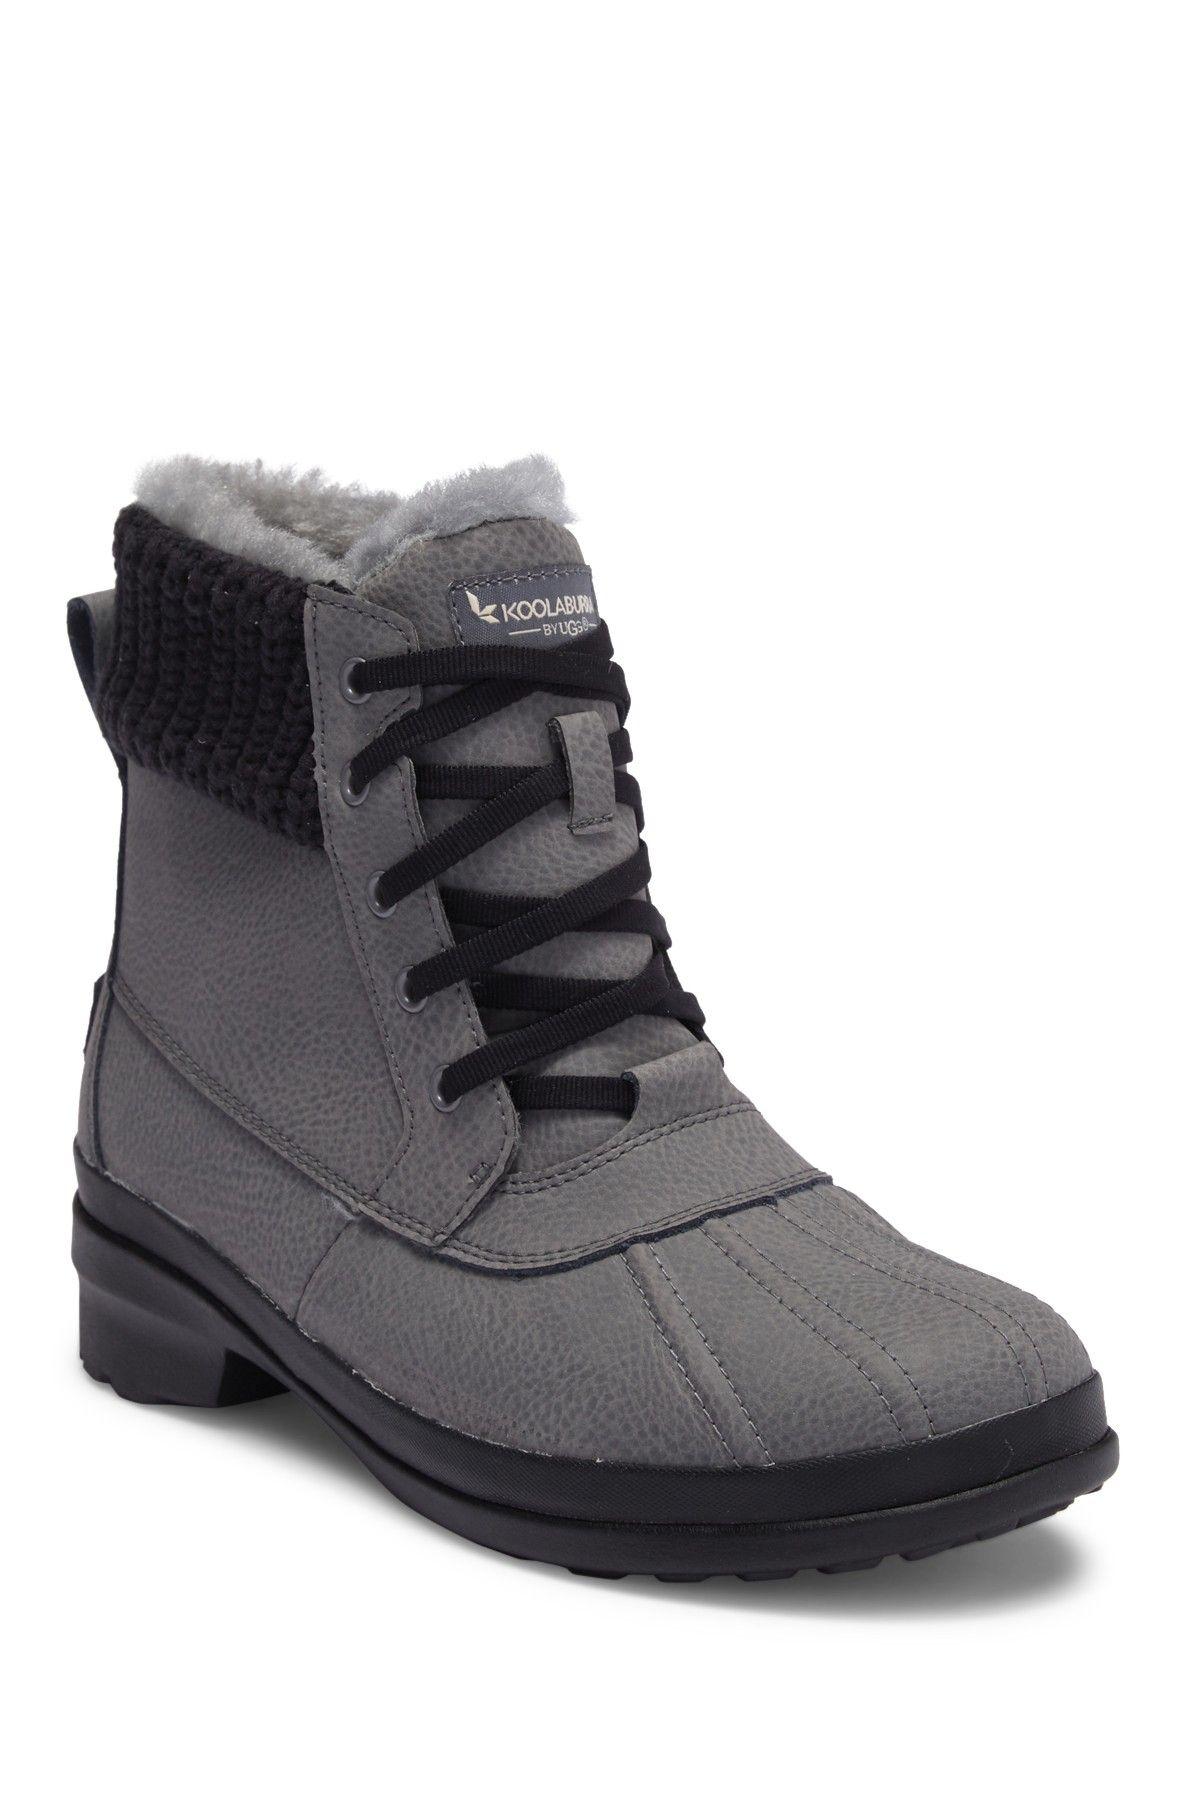 44eeac22f18 KOOLABURRA BY UGG | Sylia Waterproof Winter Boot | Clothes ...